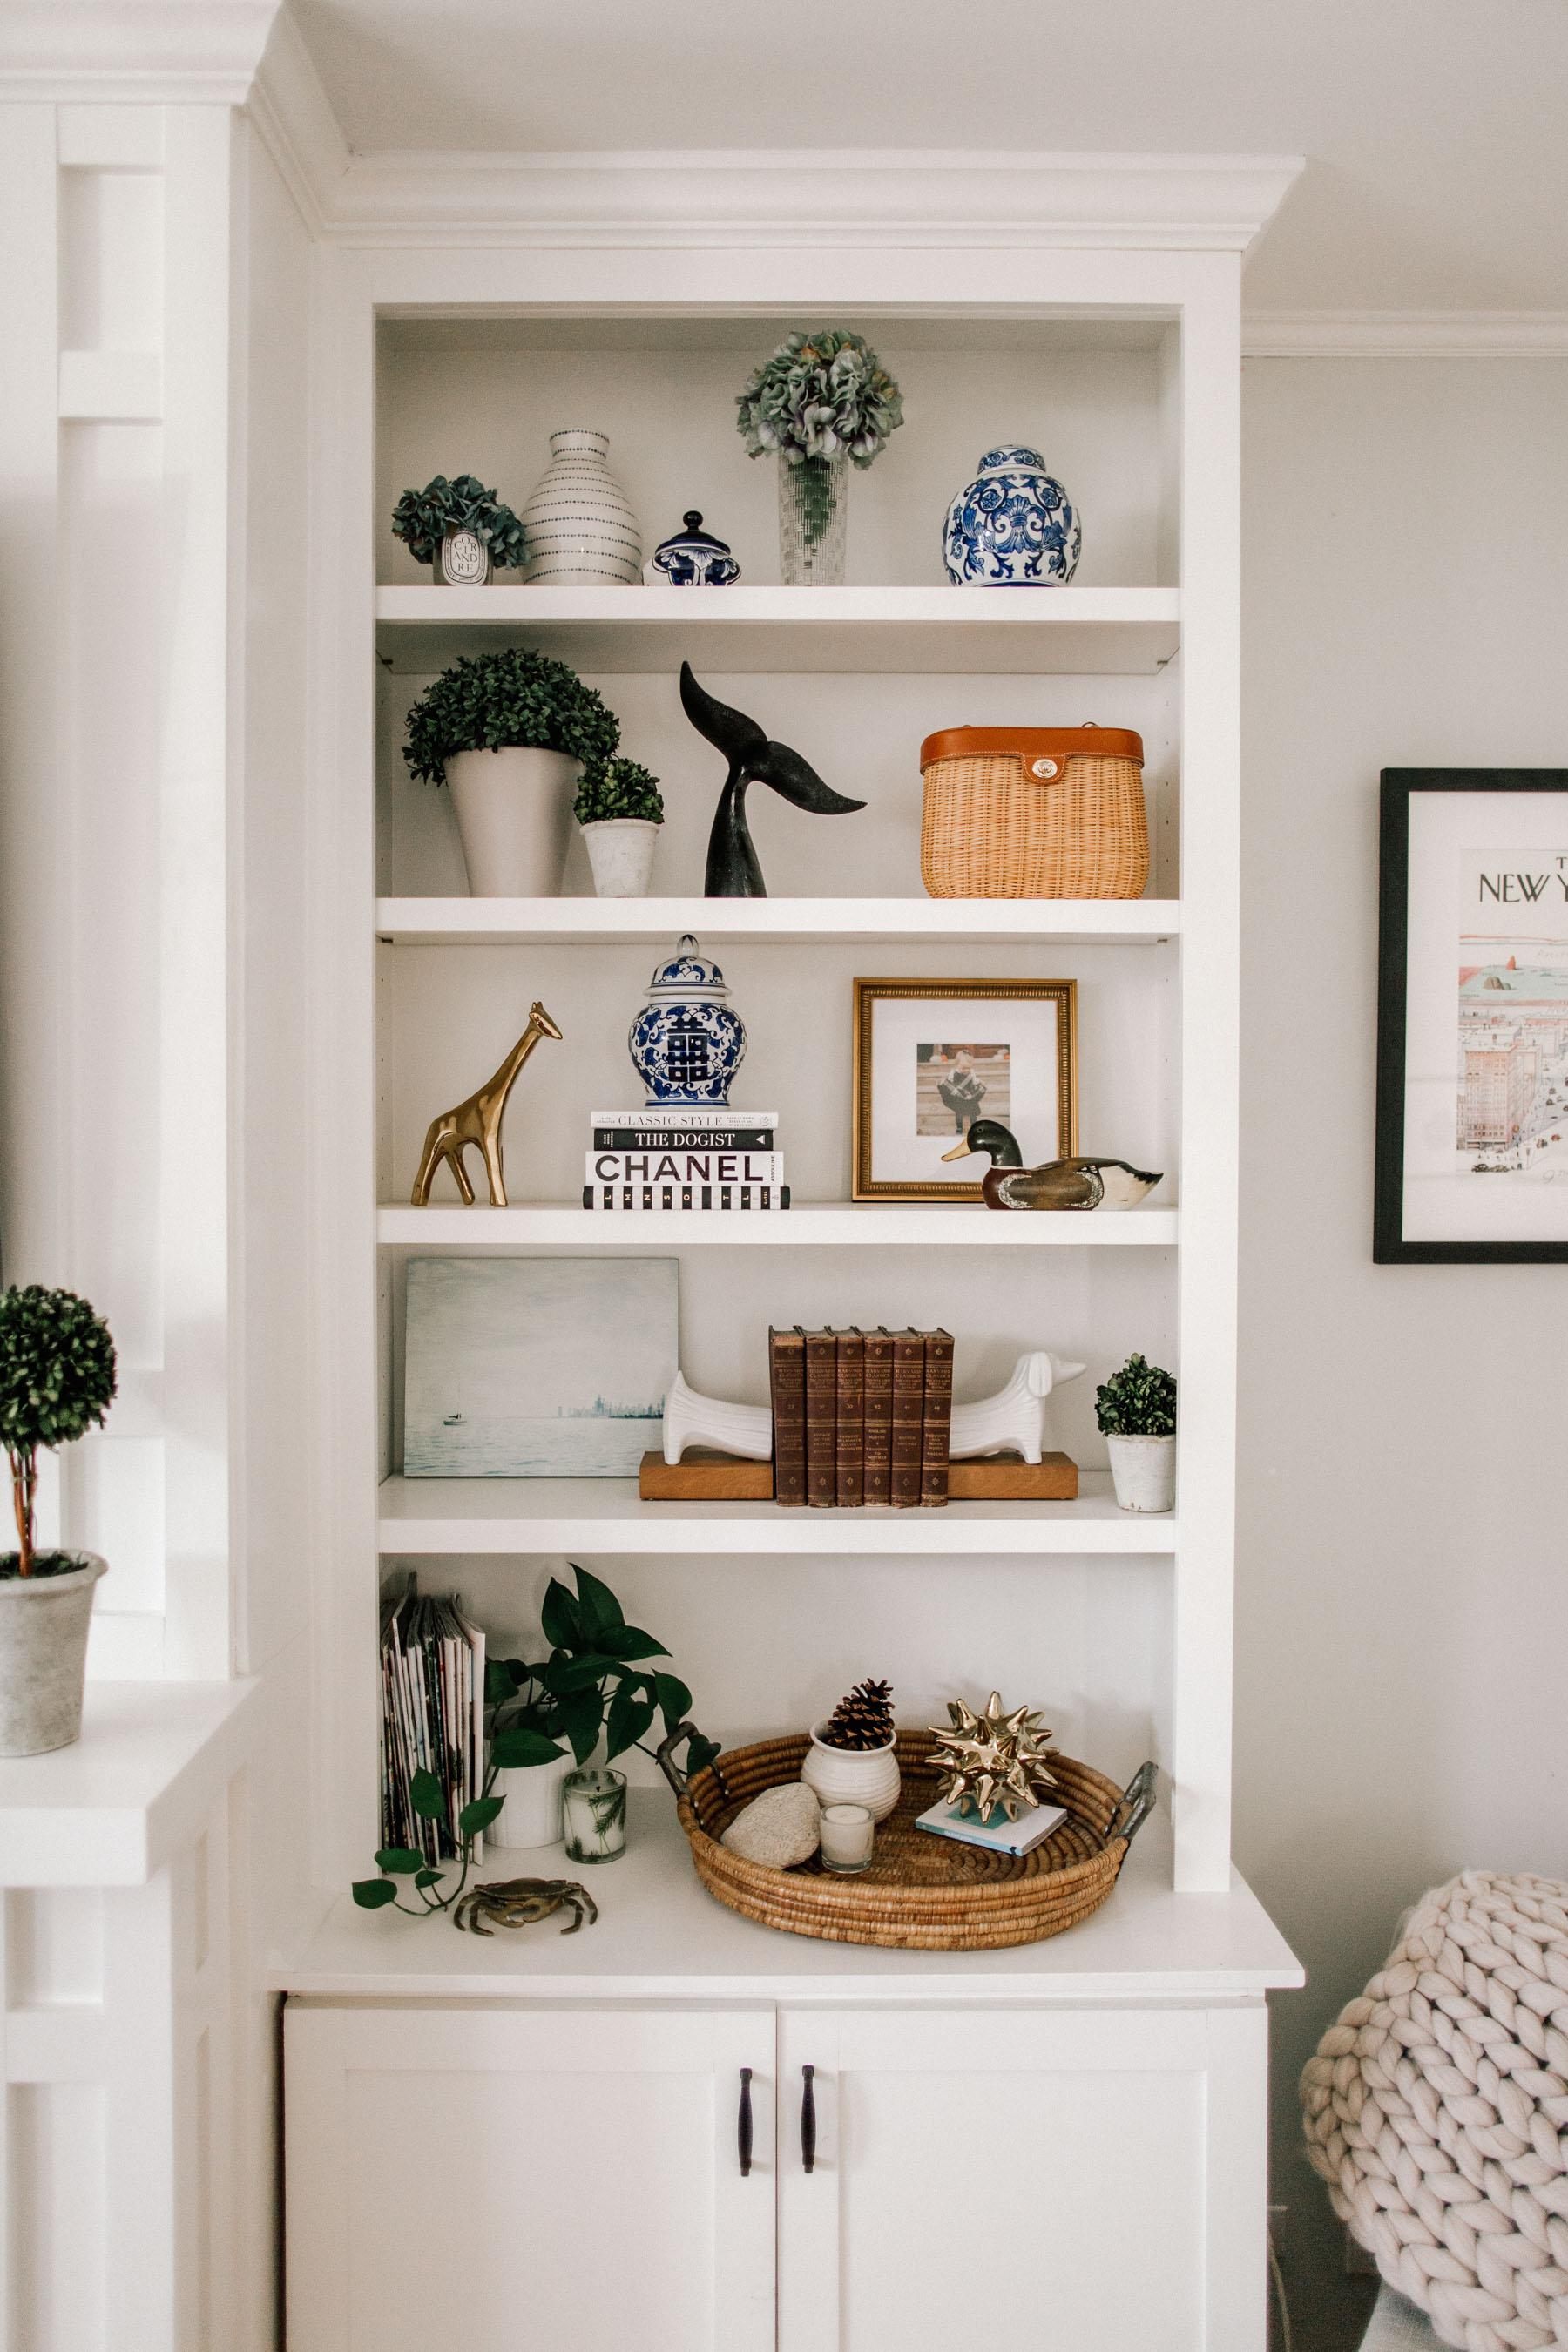 How to Style Preppy Bookshelves